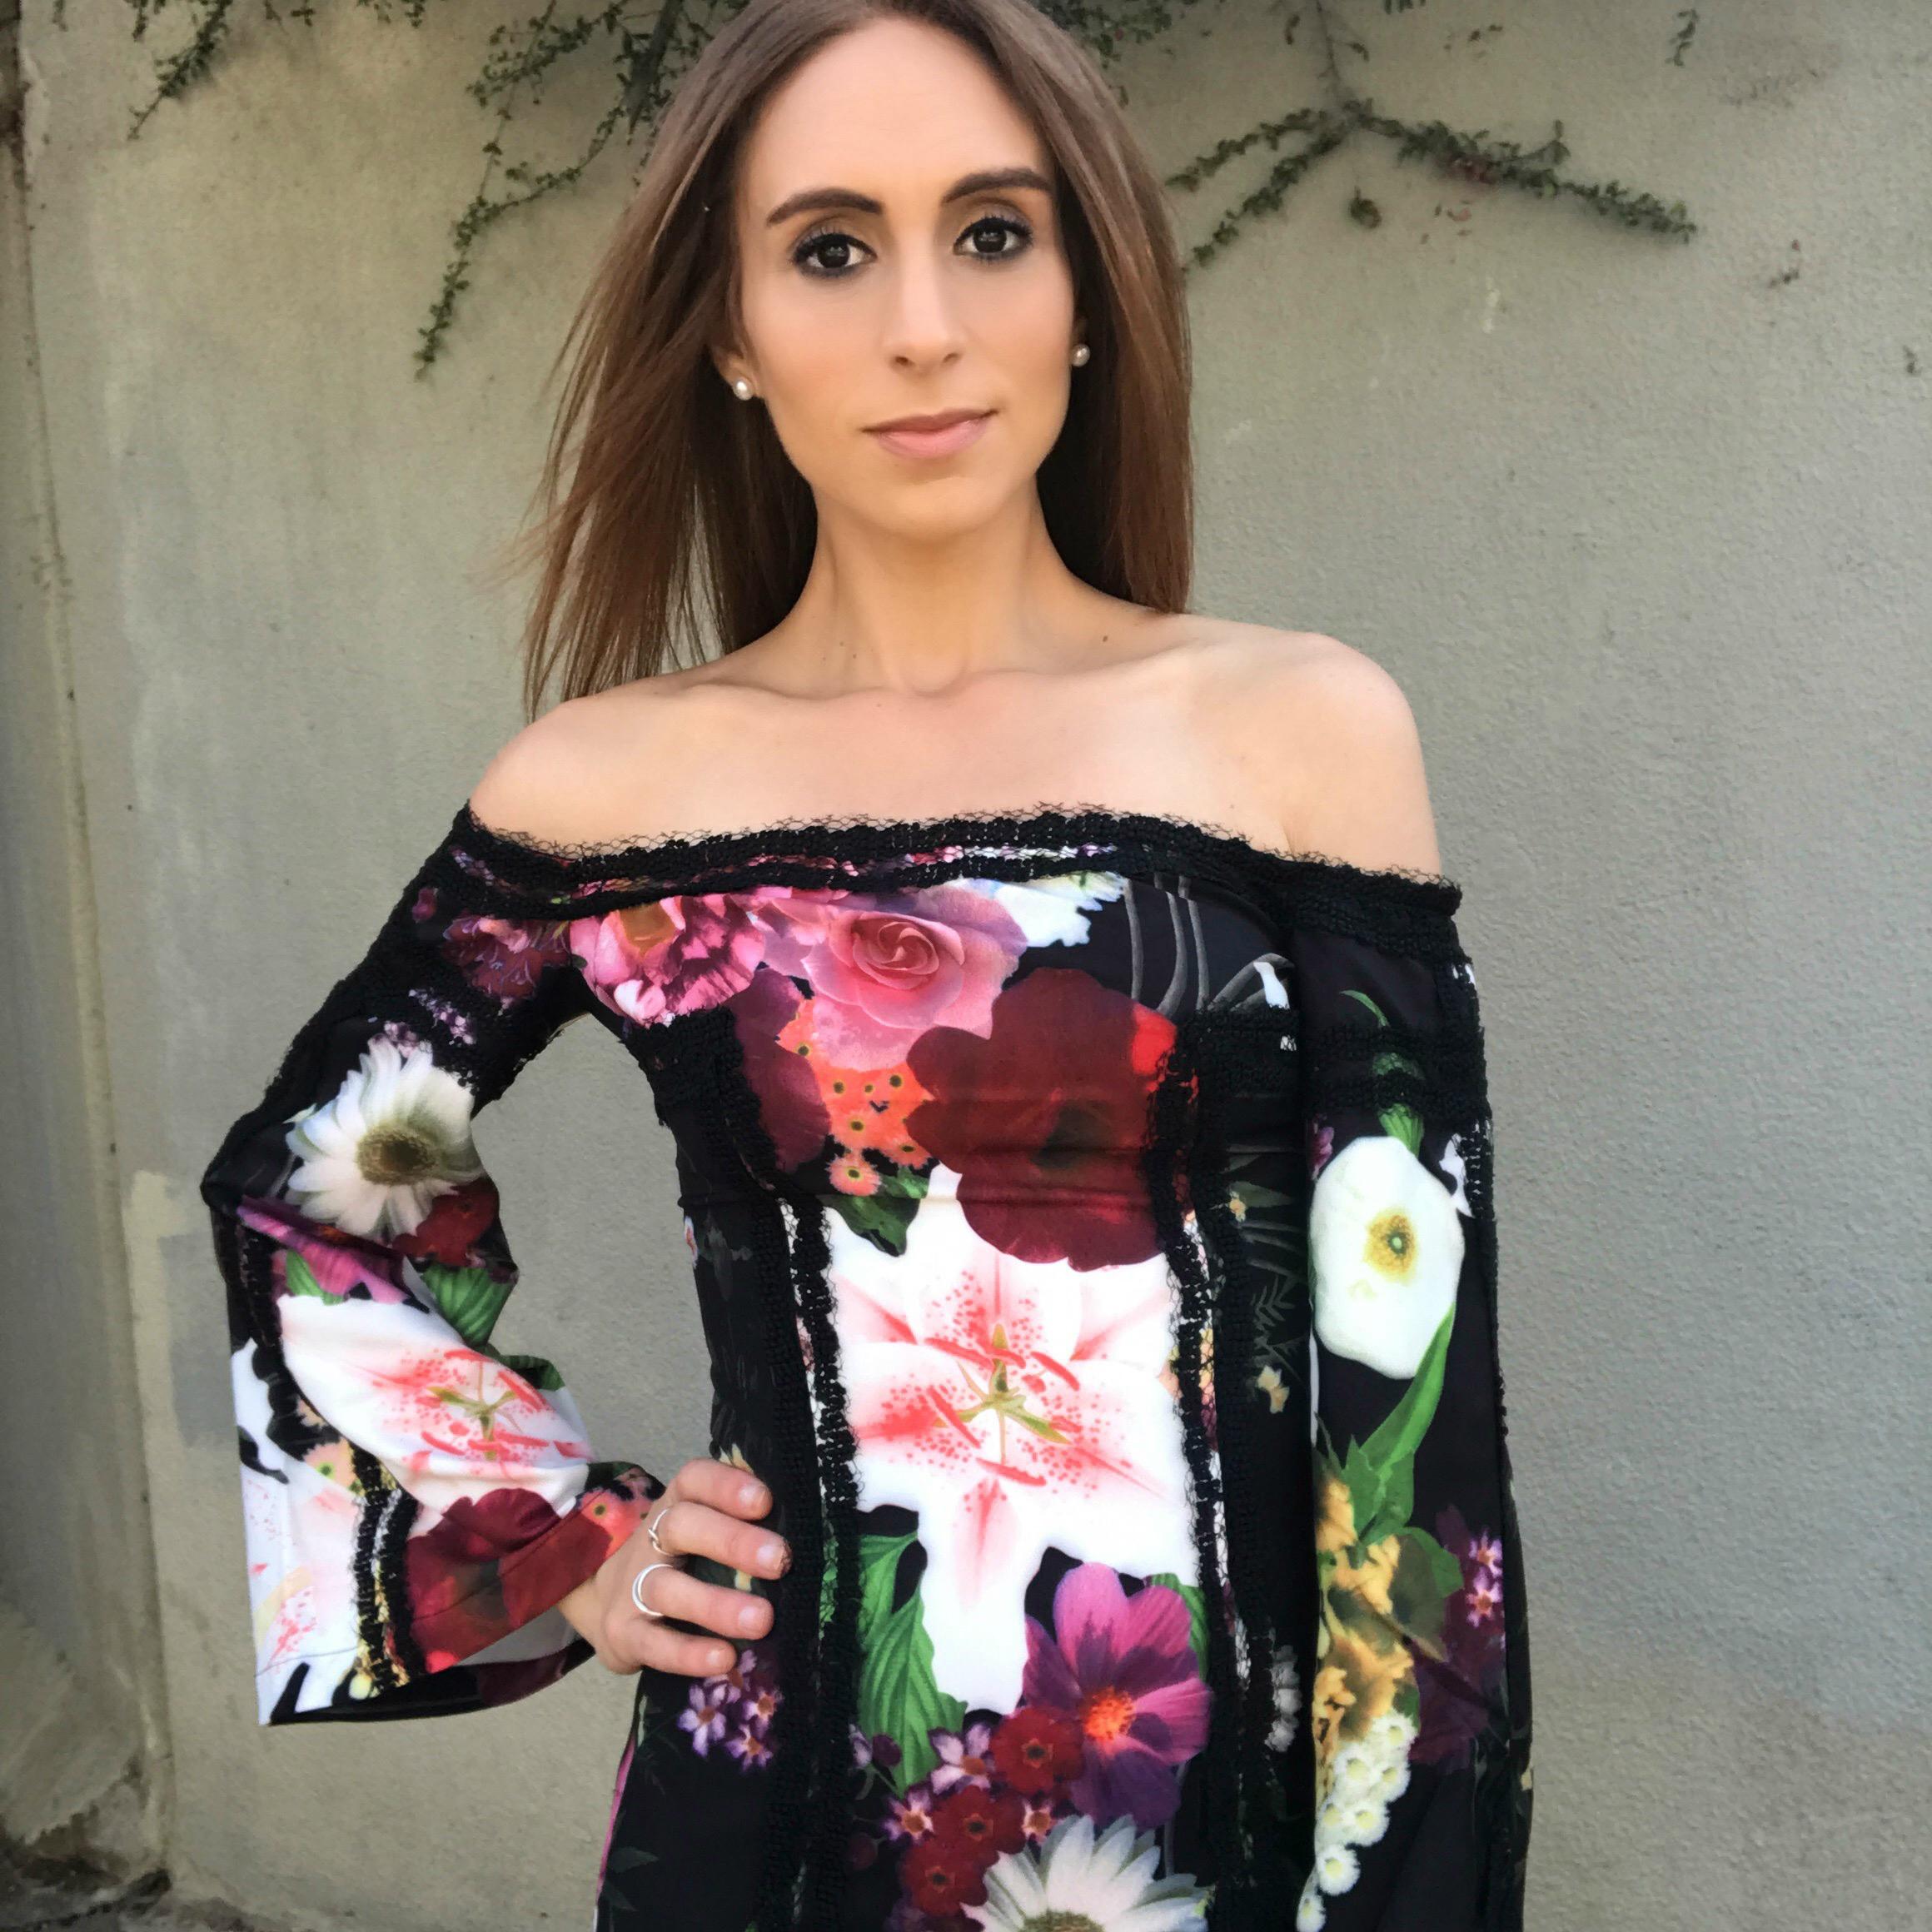 Mossman she walks in roses dress